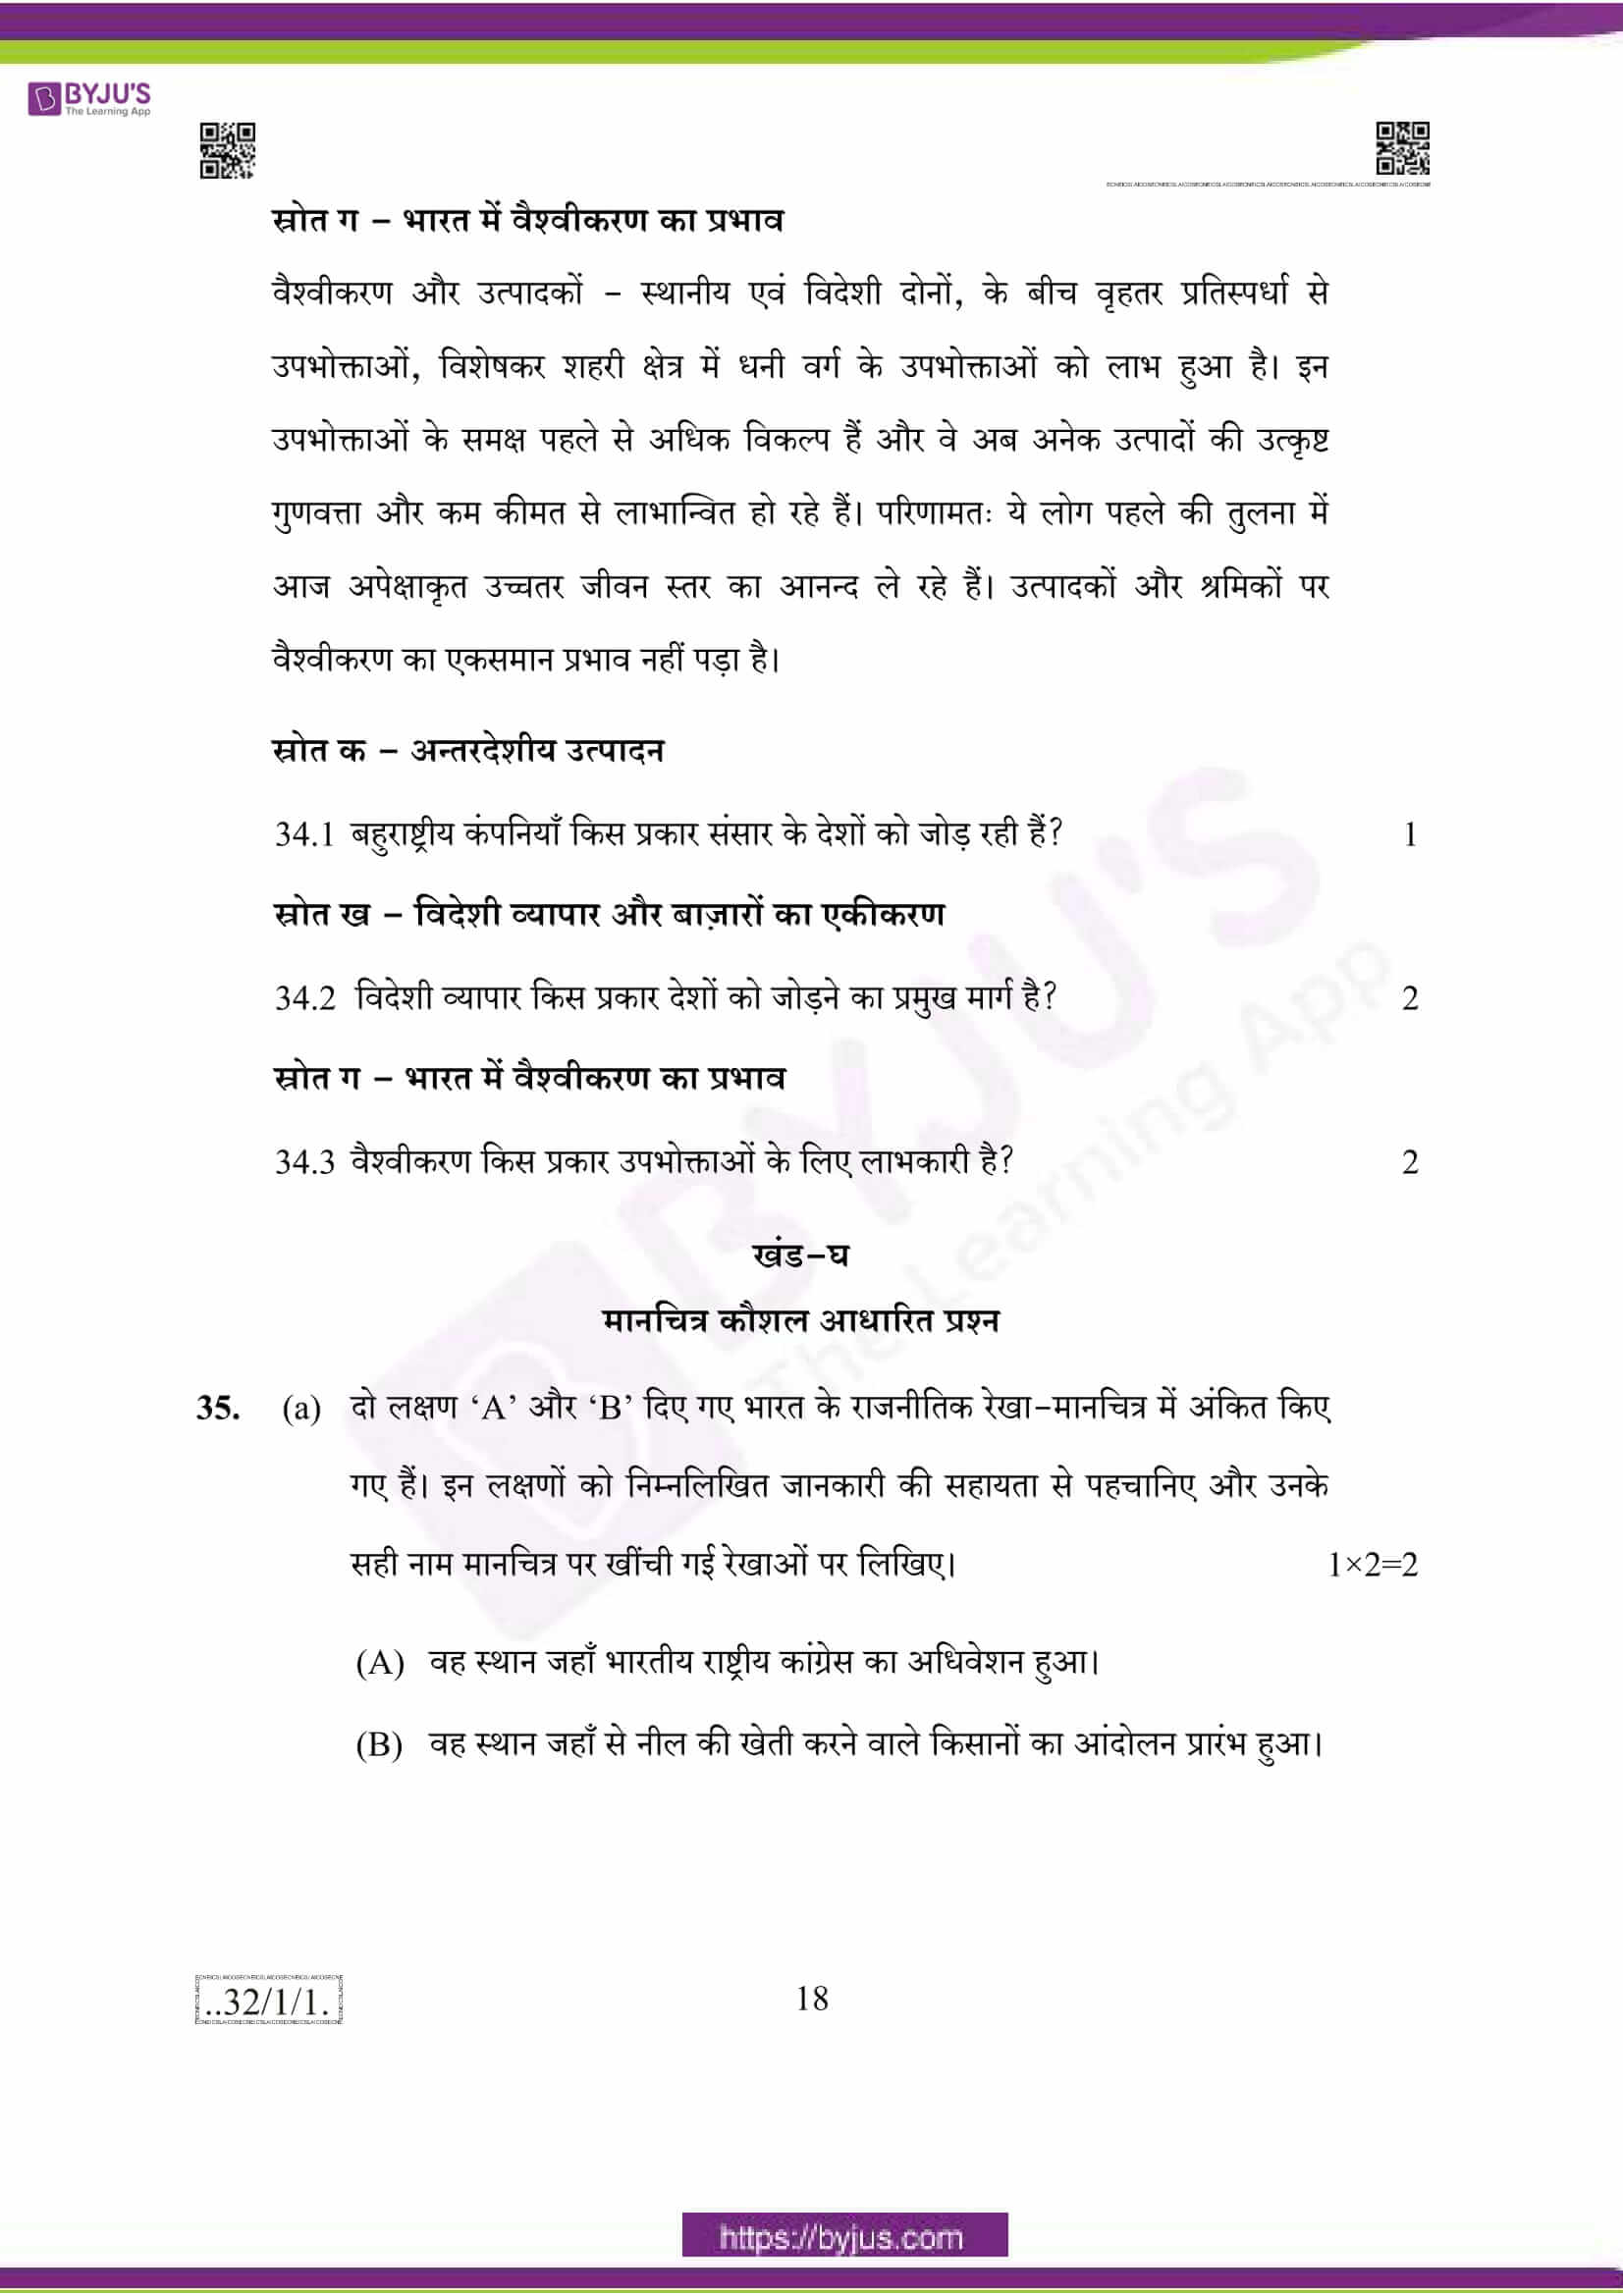 cbse class 10 social science question paper 2020 18